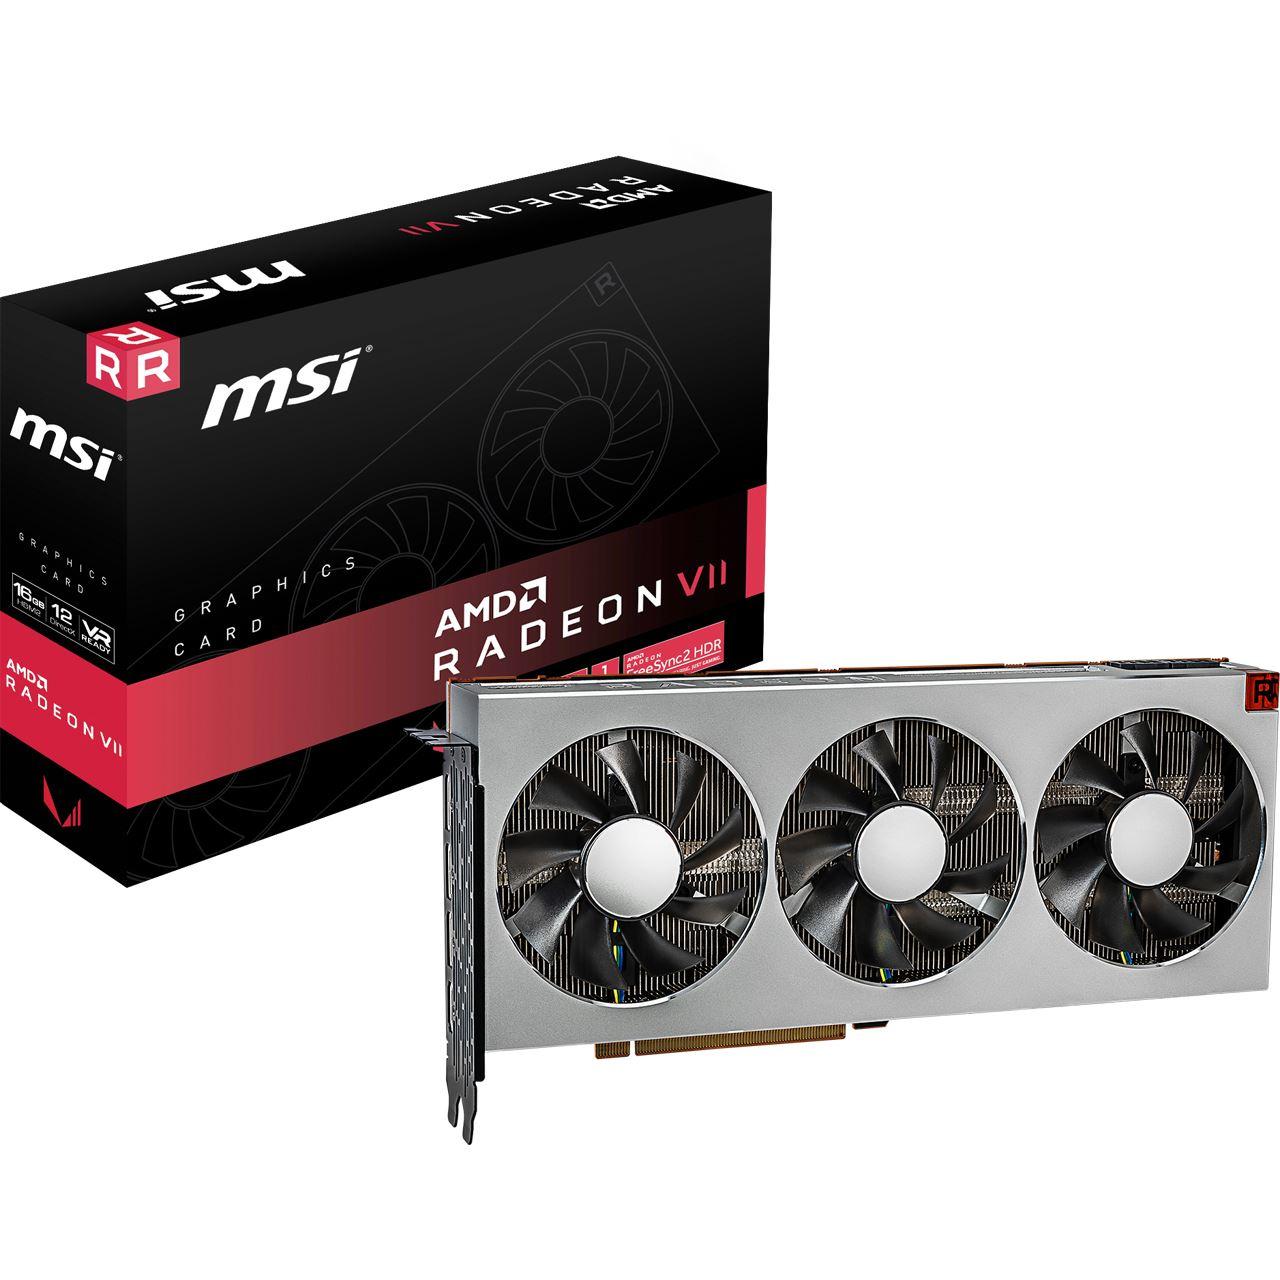 Retail 16GB MSI Radeon VII Aktiv PCIe 3.0 x16